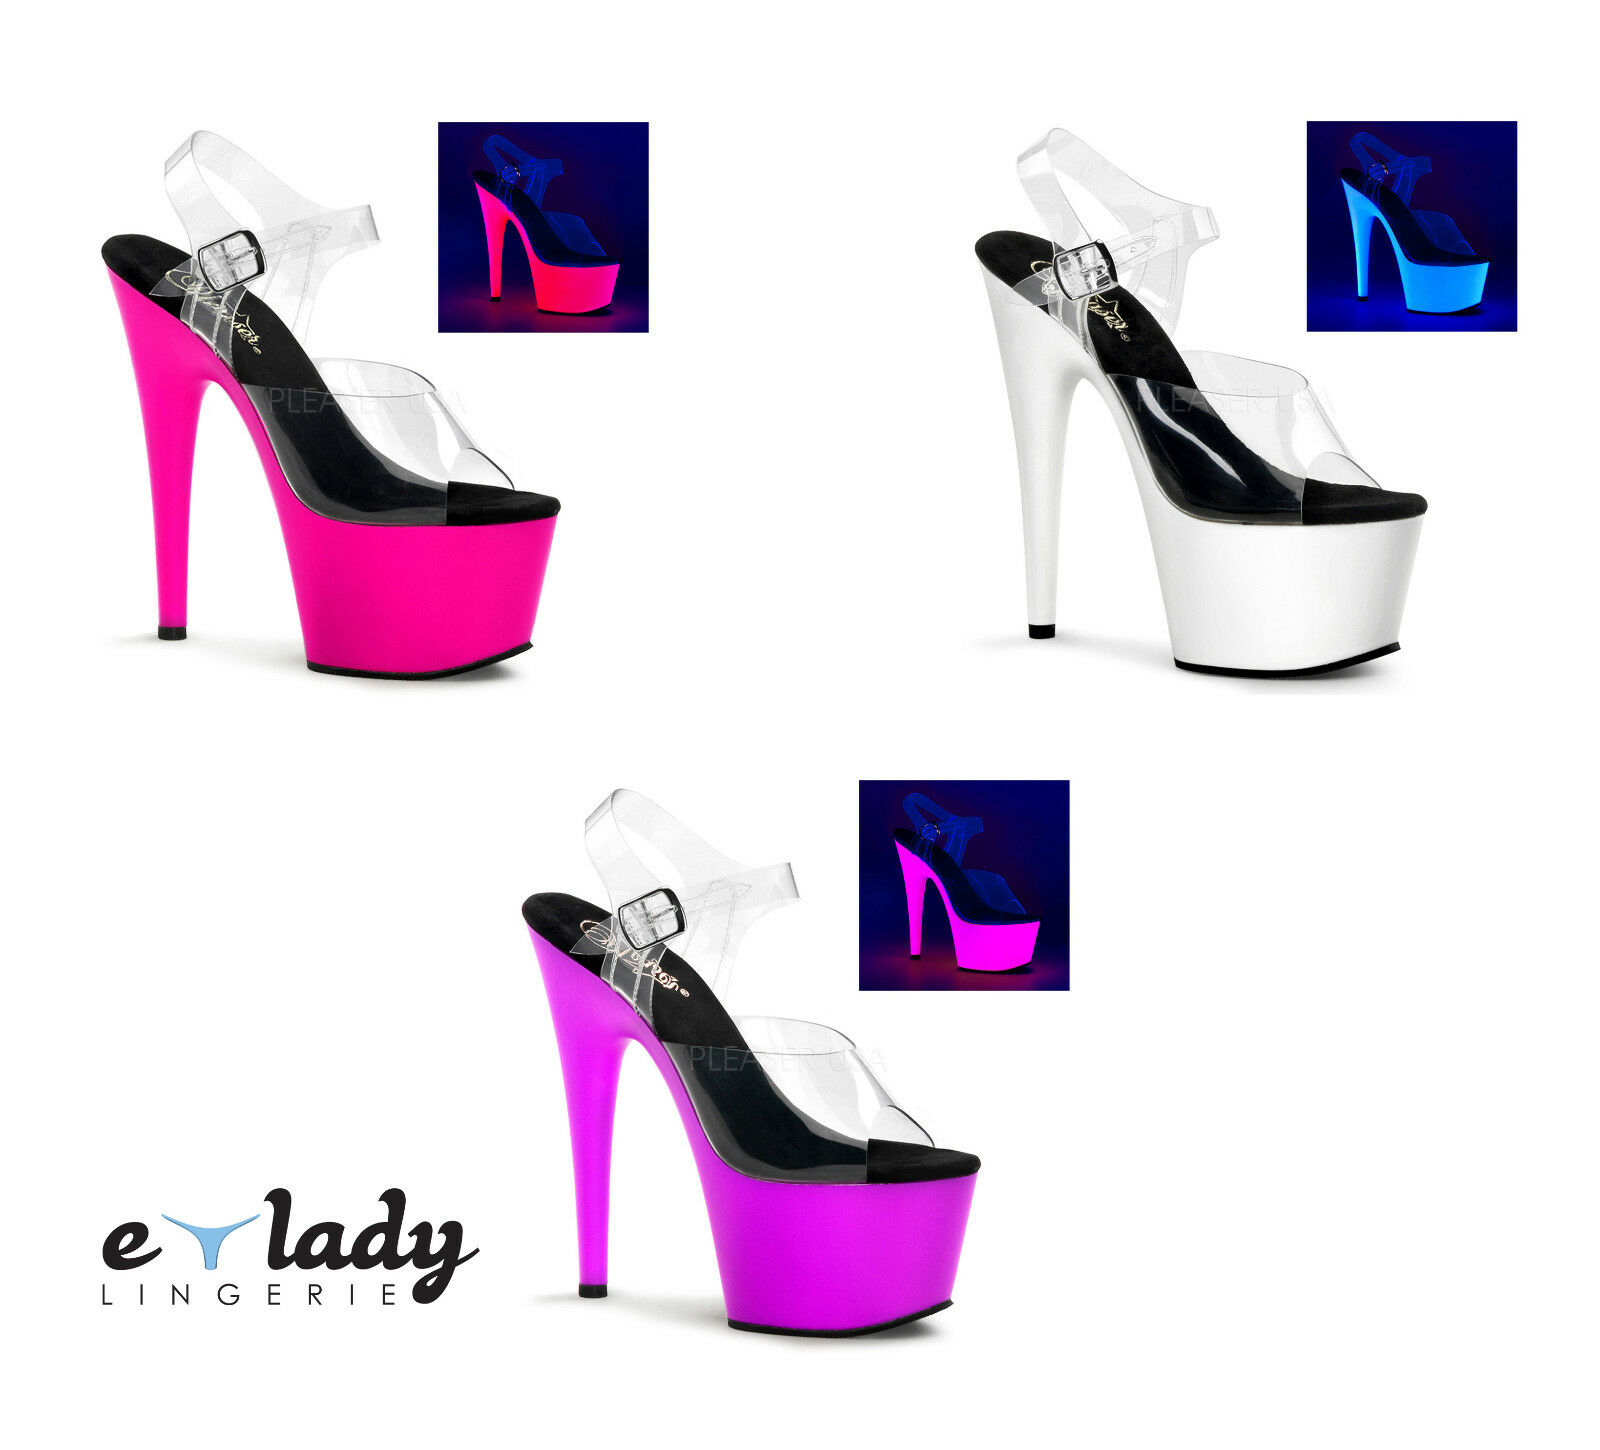 sports shoes d4fda 1707d PLEASER PLEASER PLEASER PLEASER PLEASER ADORE 708uv Scarpe 81c1fc 32dc8c